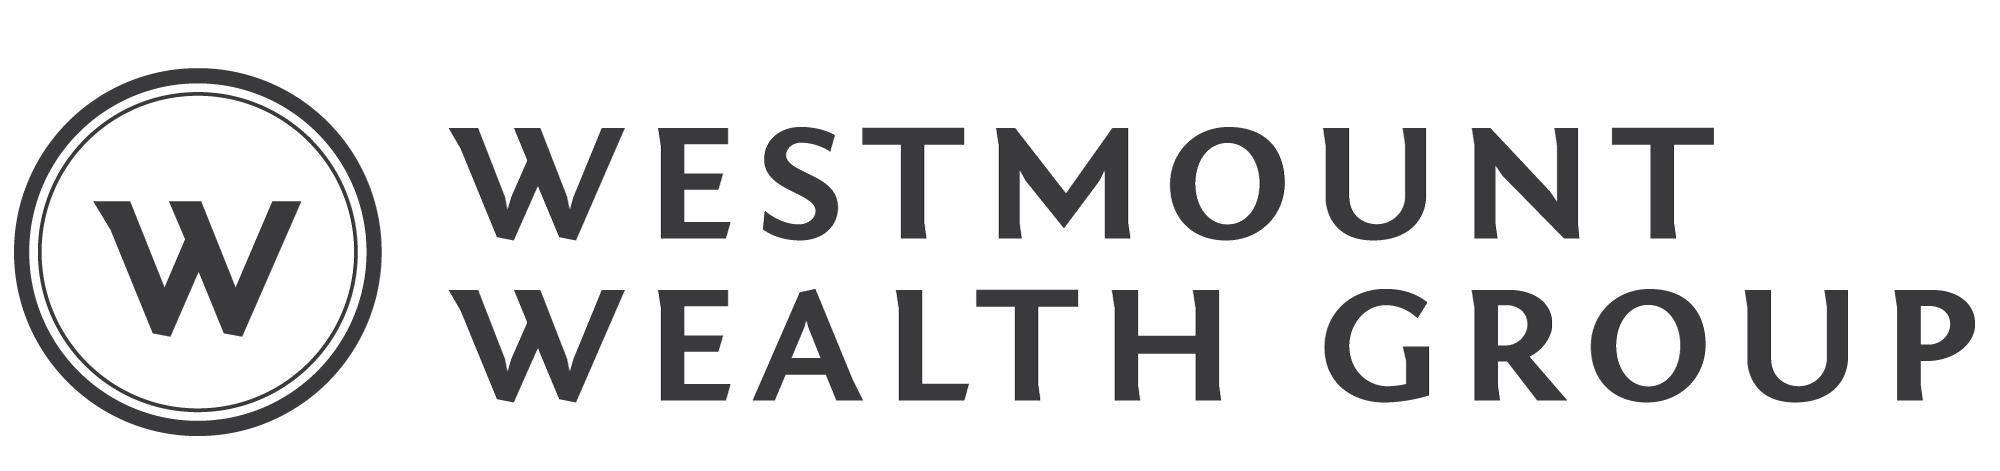 Westmount Wealth Group